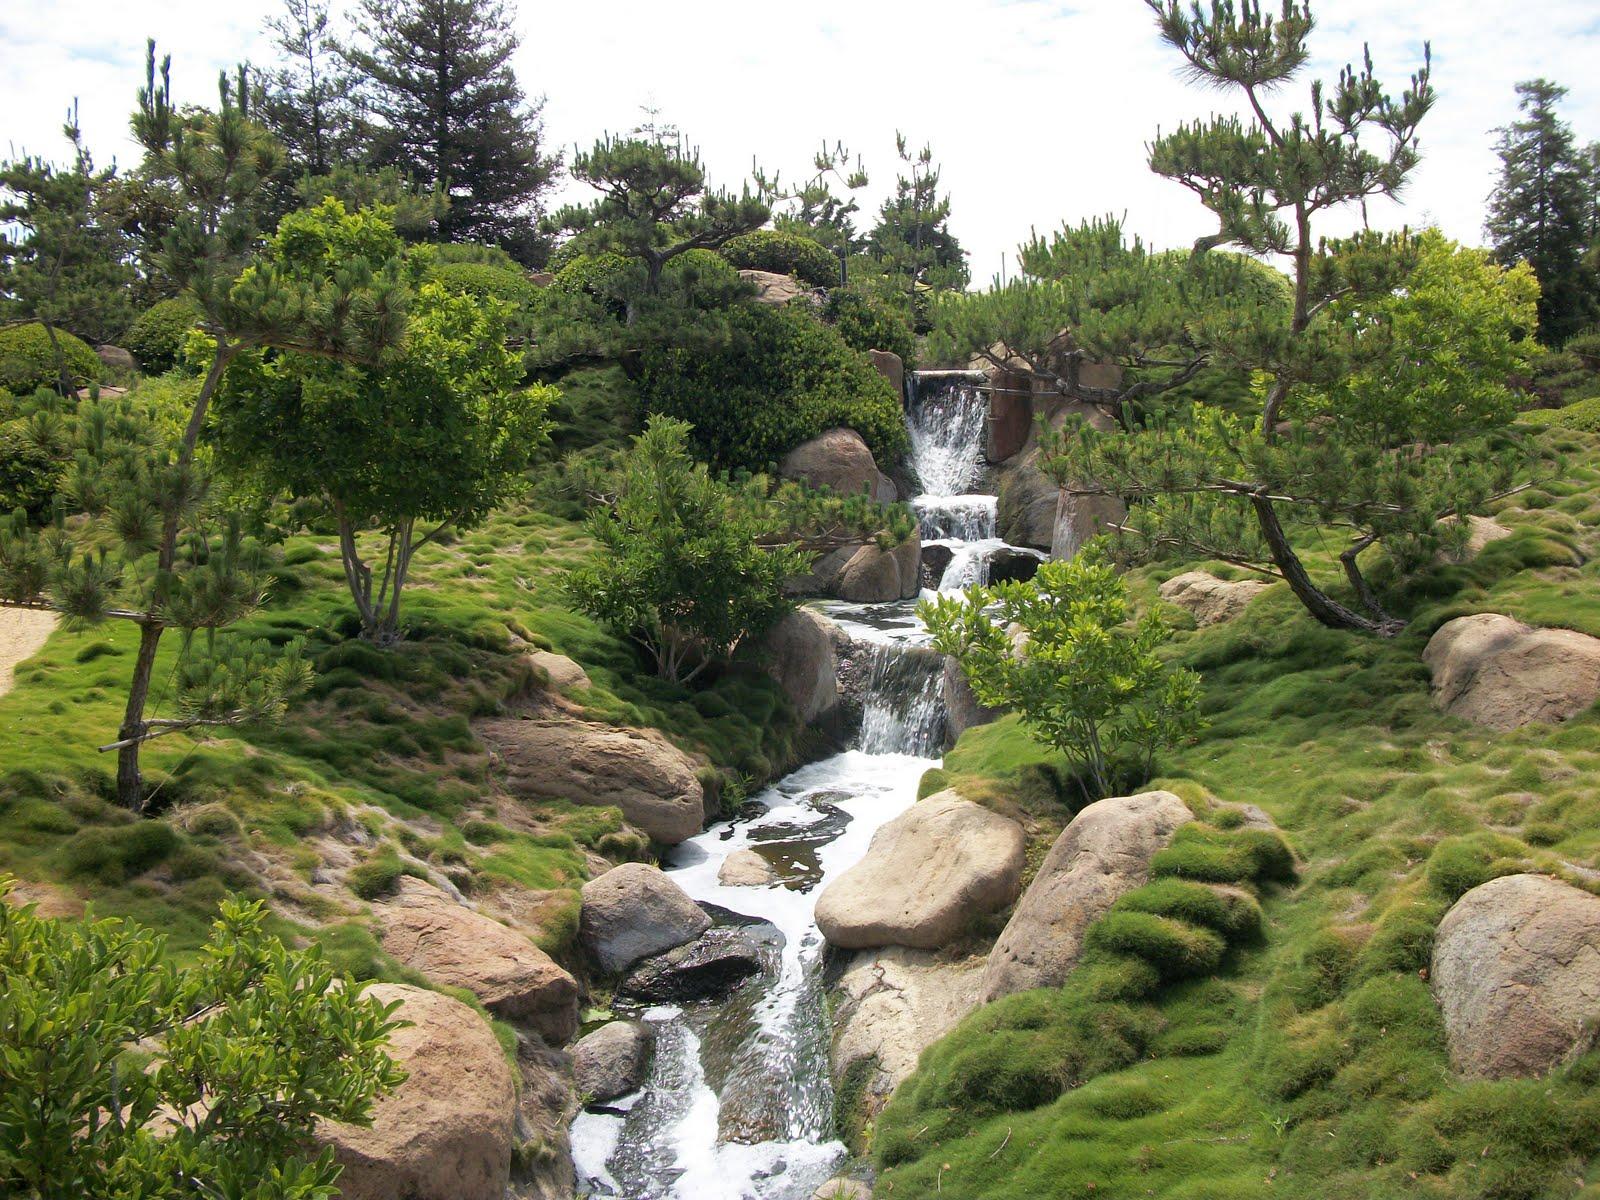 Los Angeles Japanese Garden: Valley Dude: The Japanese Garden And The Donald C. Tillman